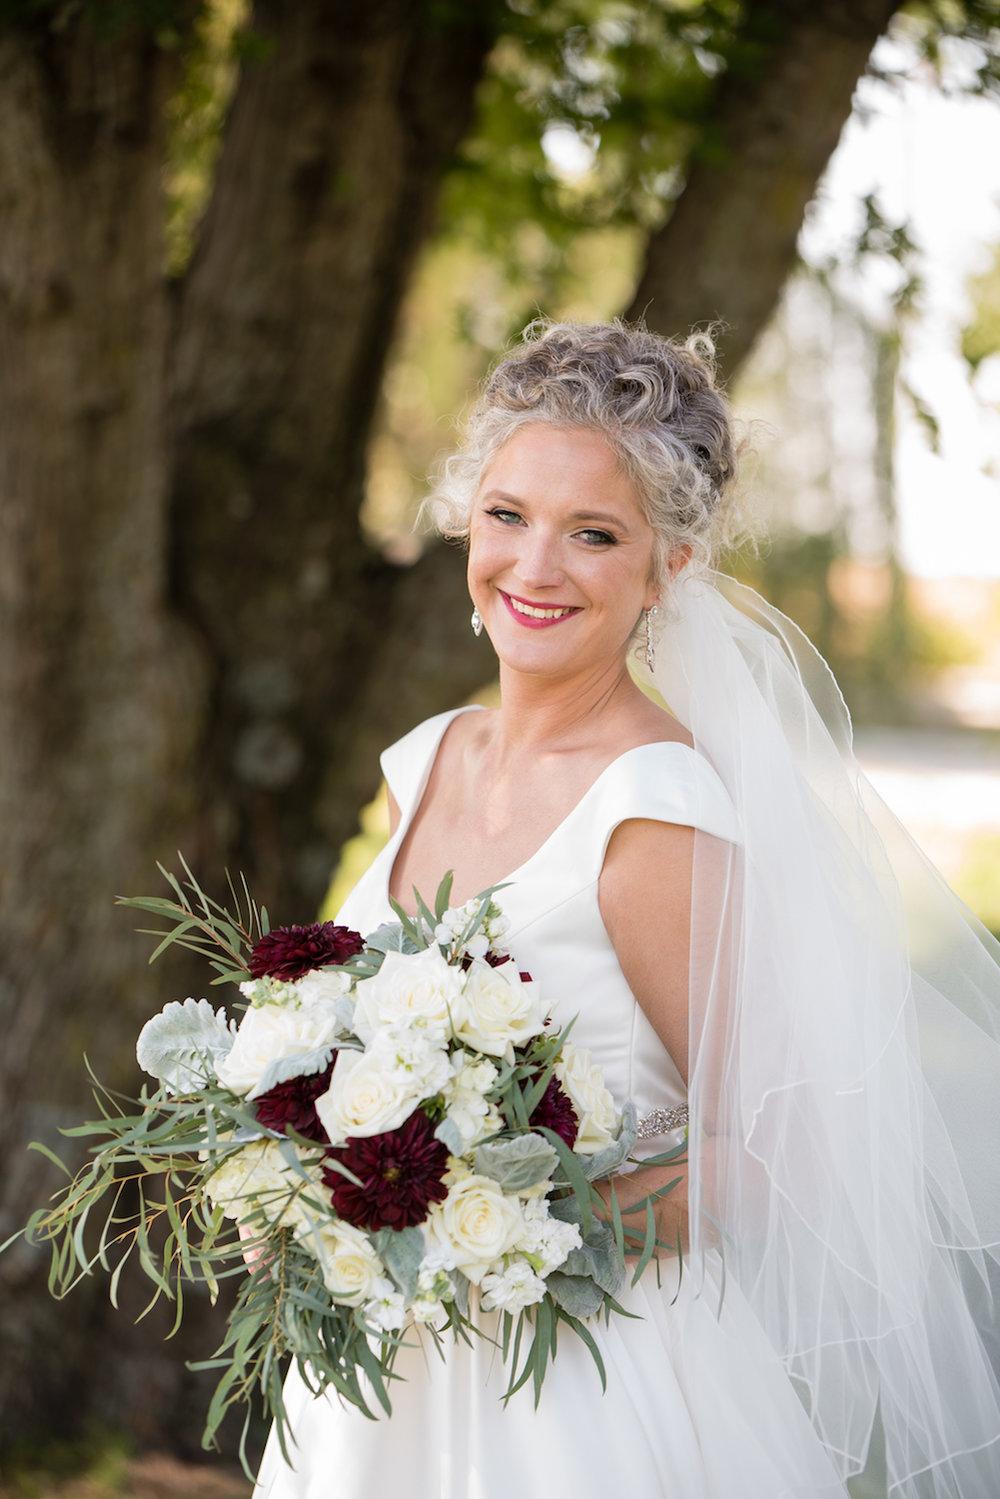 Danielle Albrecht photographer at rustic Farmington lodge inspired wedding